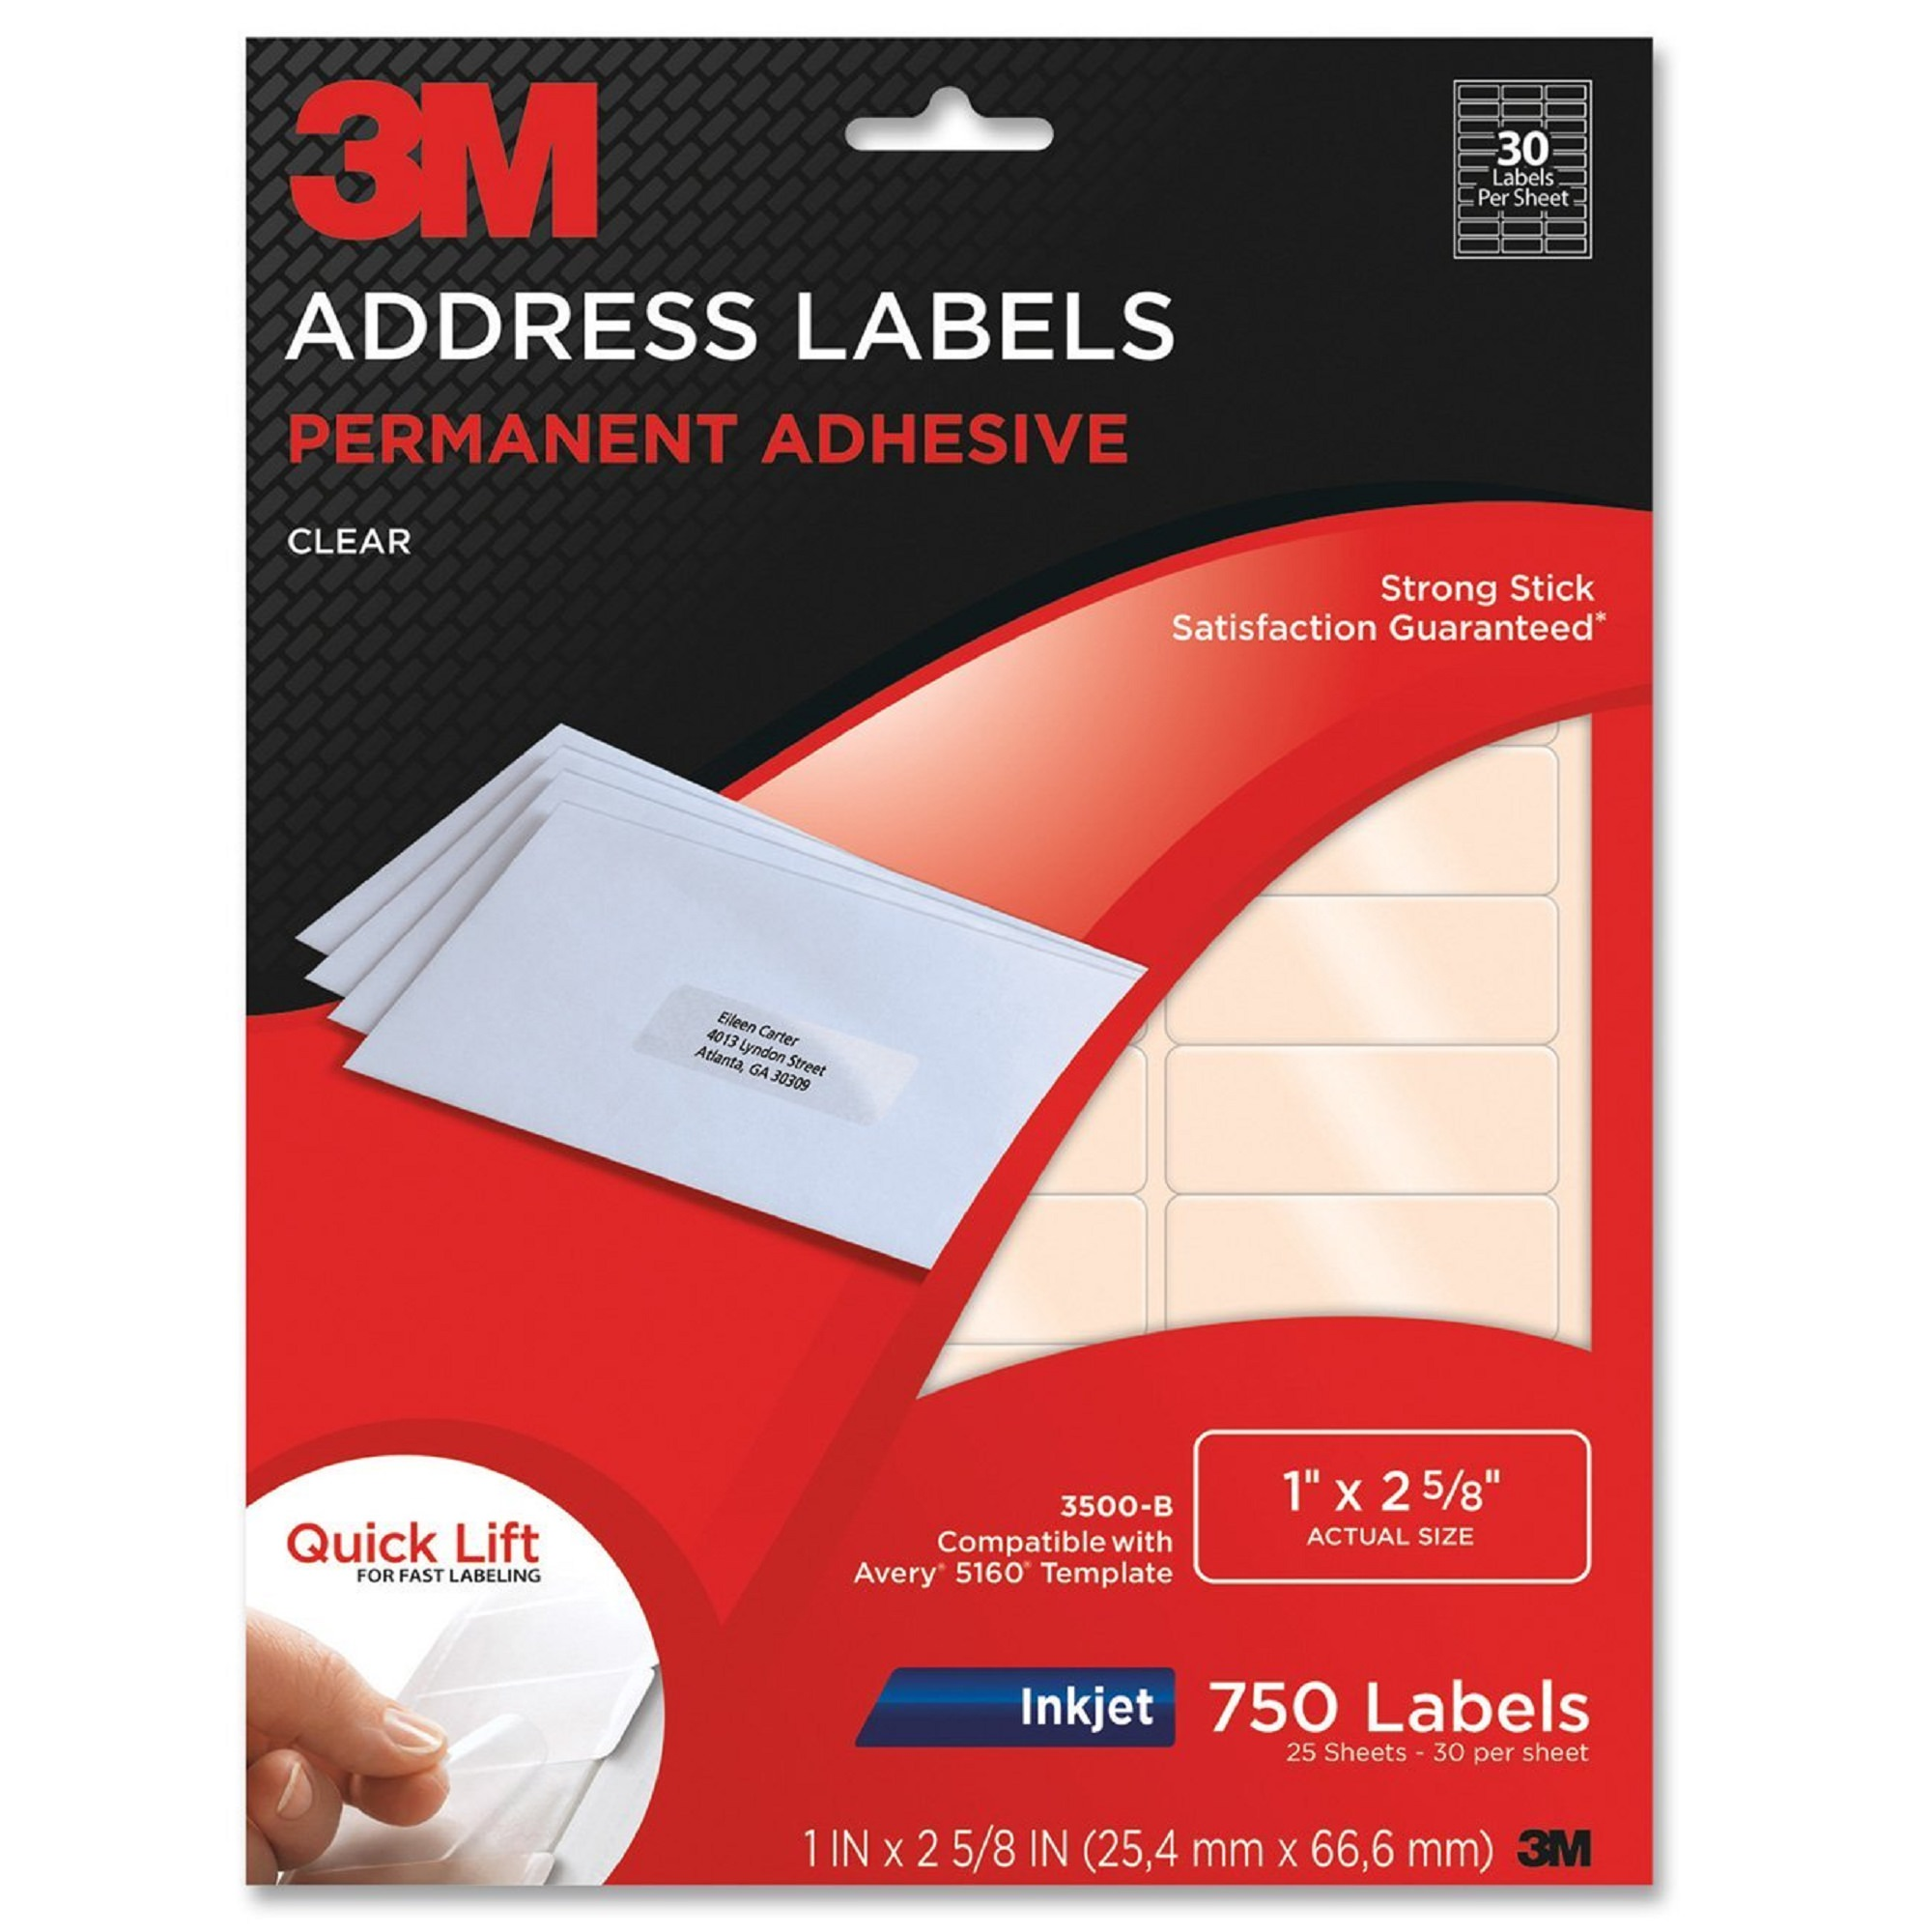 "3M Address Labels 1""x 2.62"" - 750 Clear Labels (3500-B)"